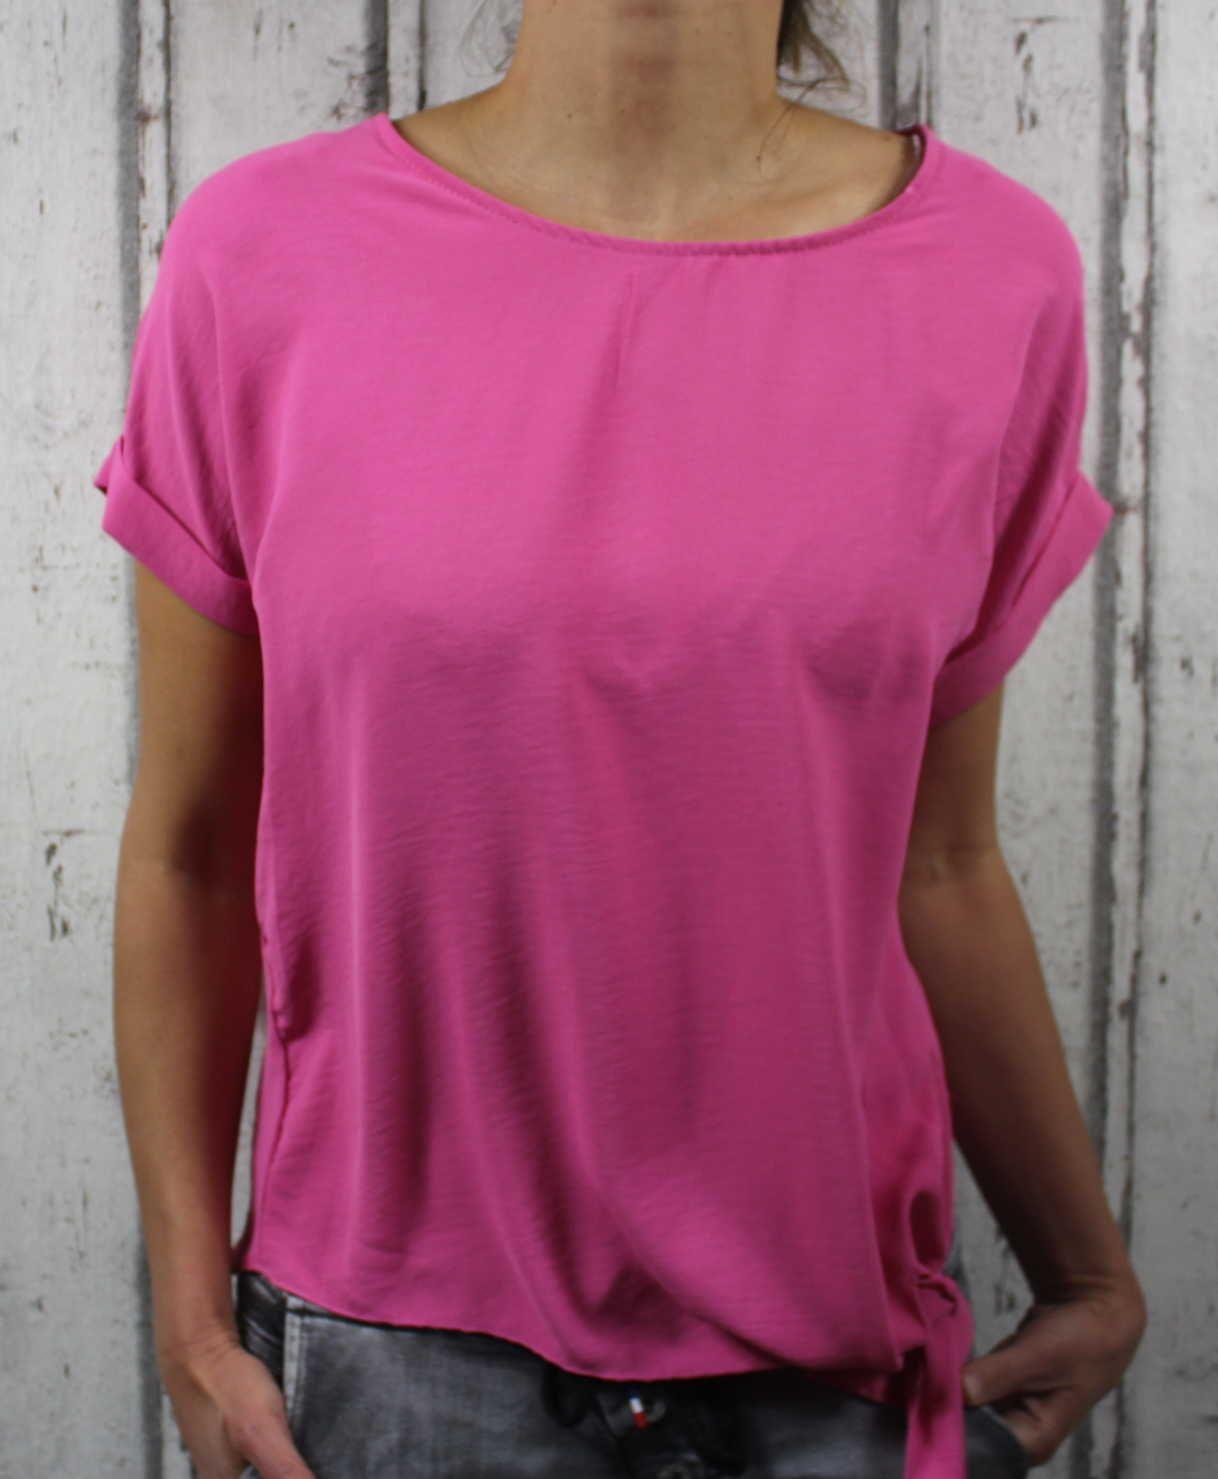 Dámská tunika, dámské tričko volný střih, dámská halenka, dámská halenka s uzlem růžová Italy Moda